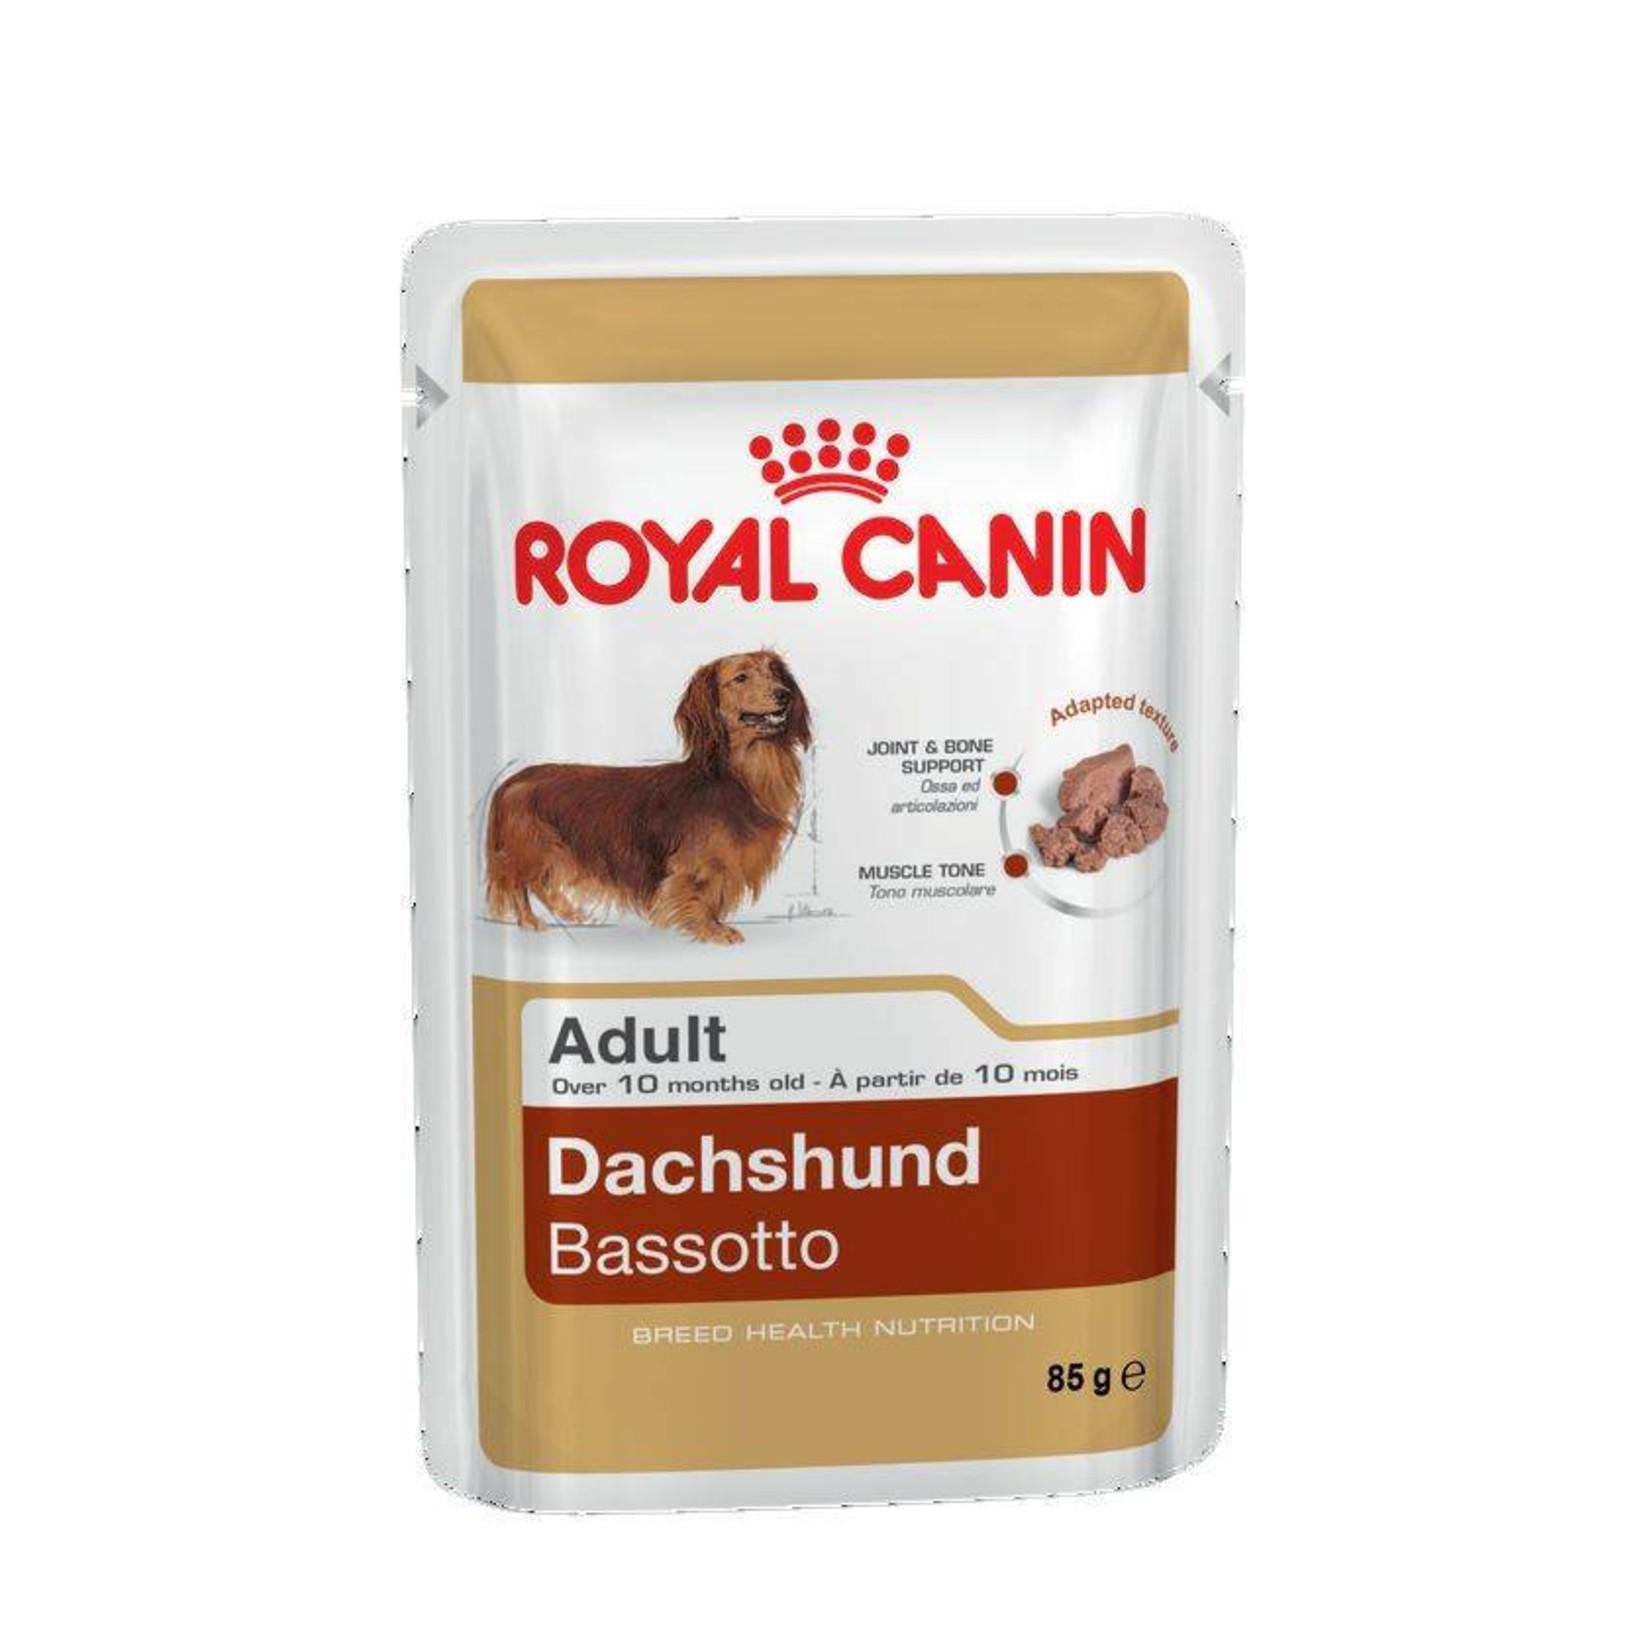 Royal Canin Dachshund Adult Dog Wet Food Pouch 85g